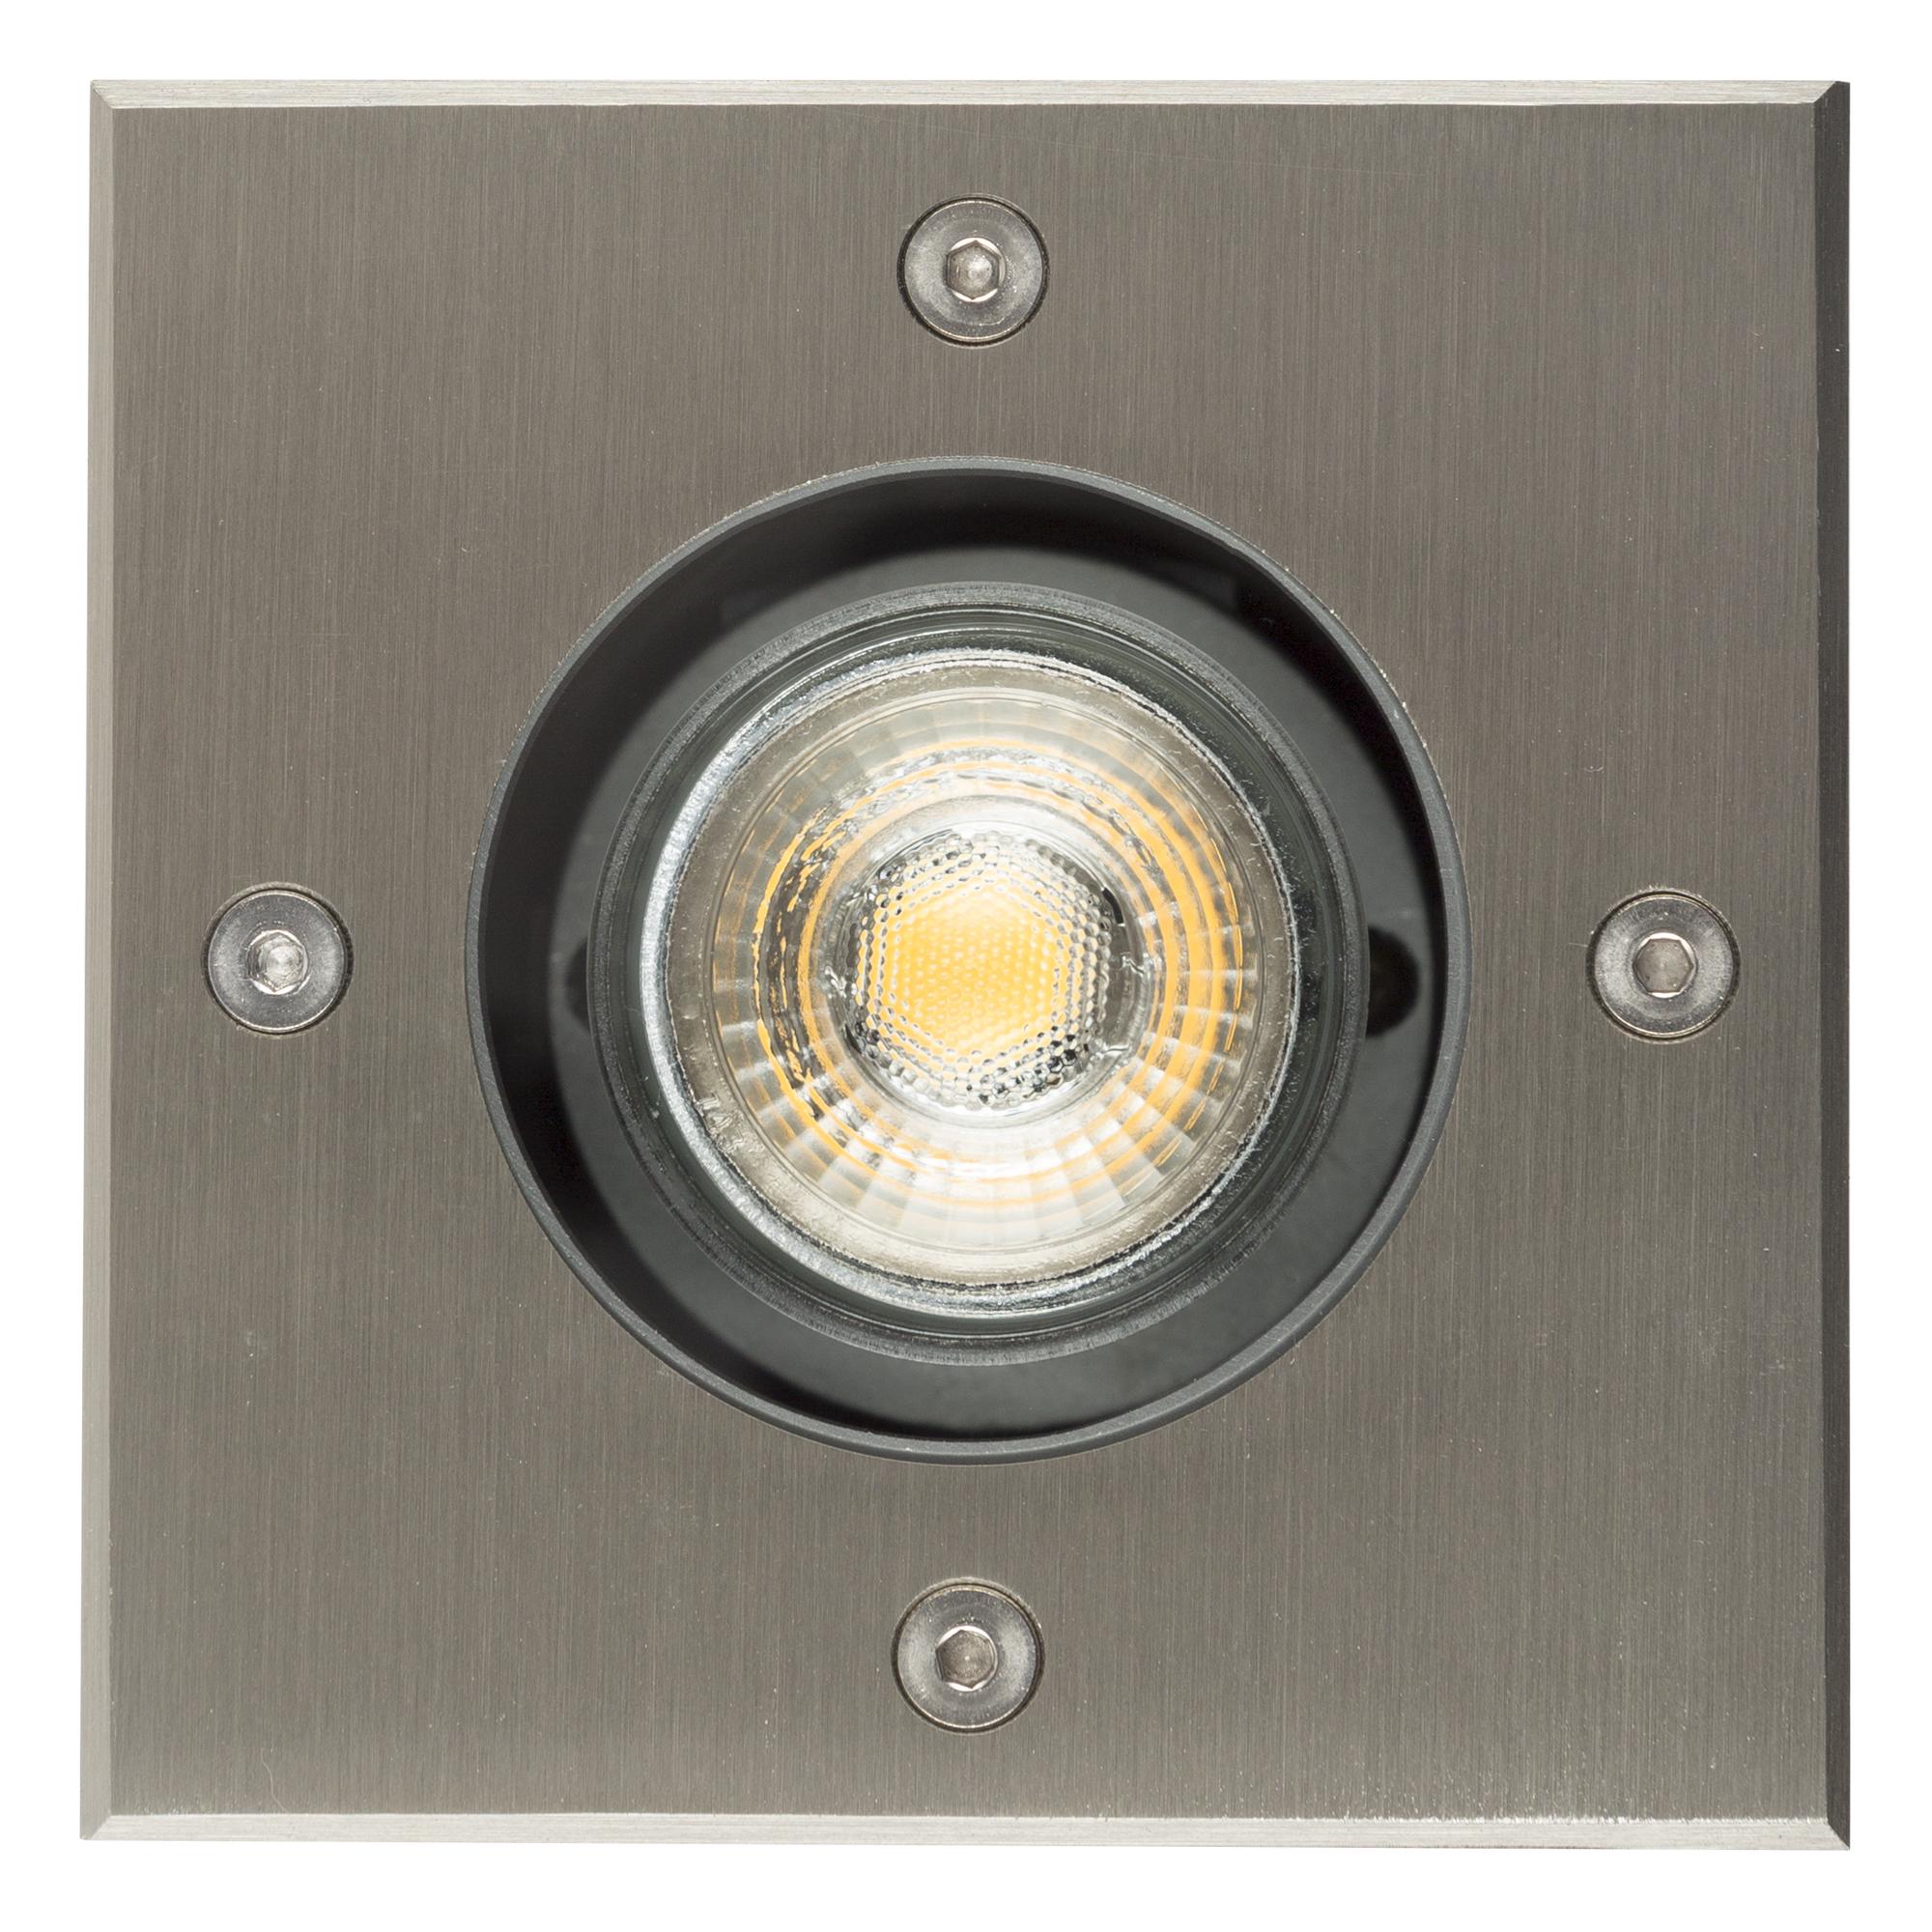 Grondspot LED Ø11 Vierkant RVS